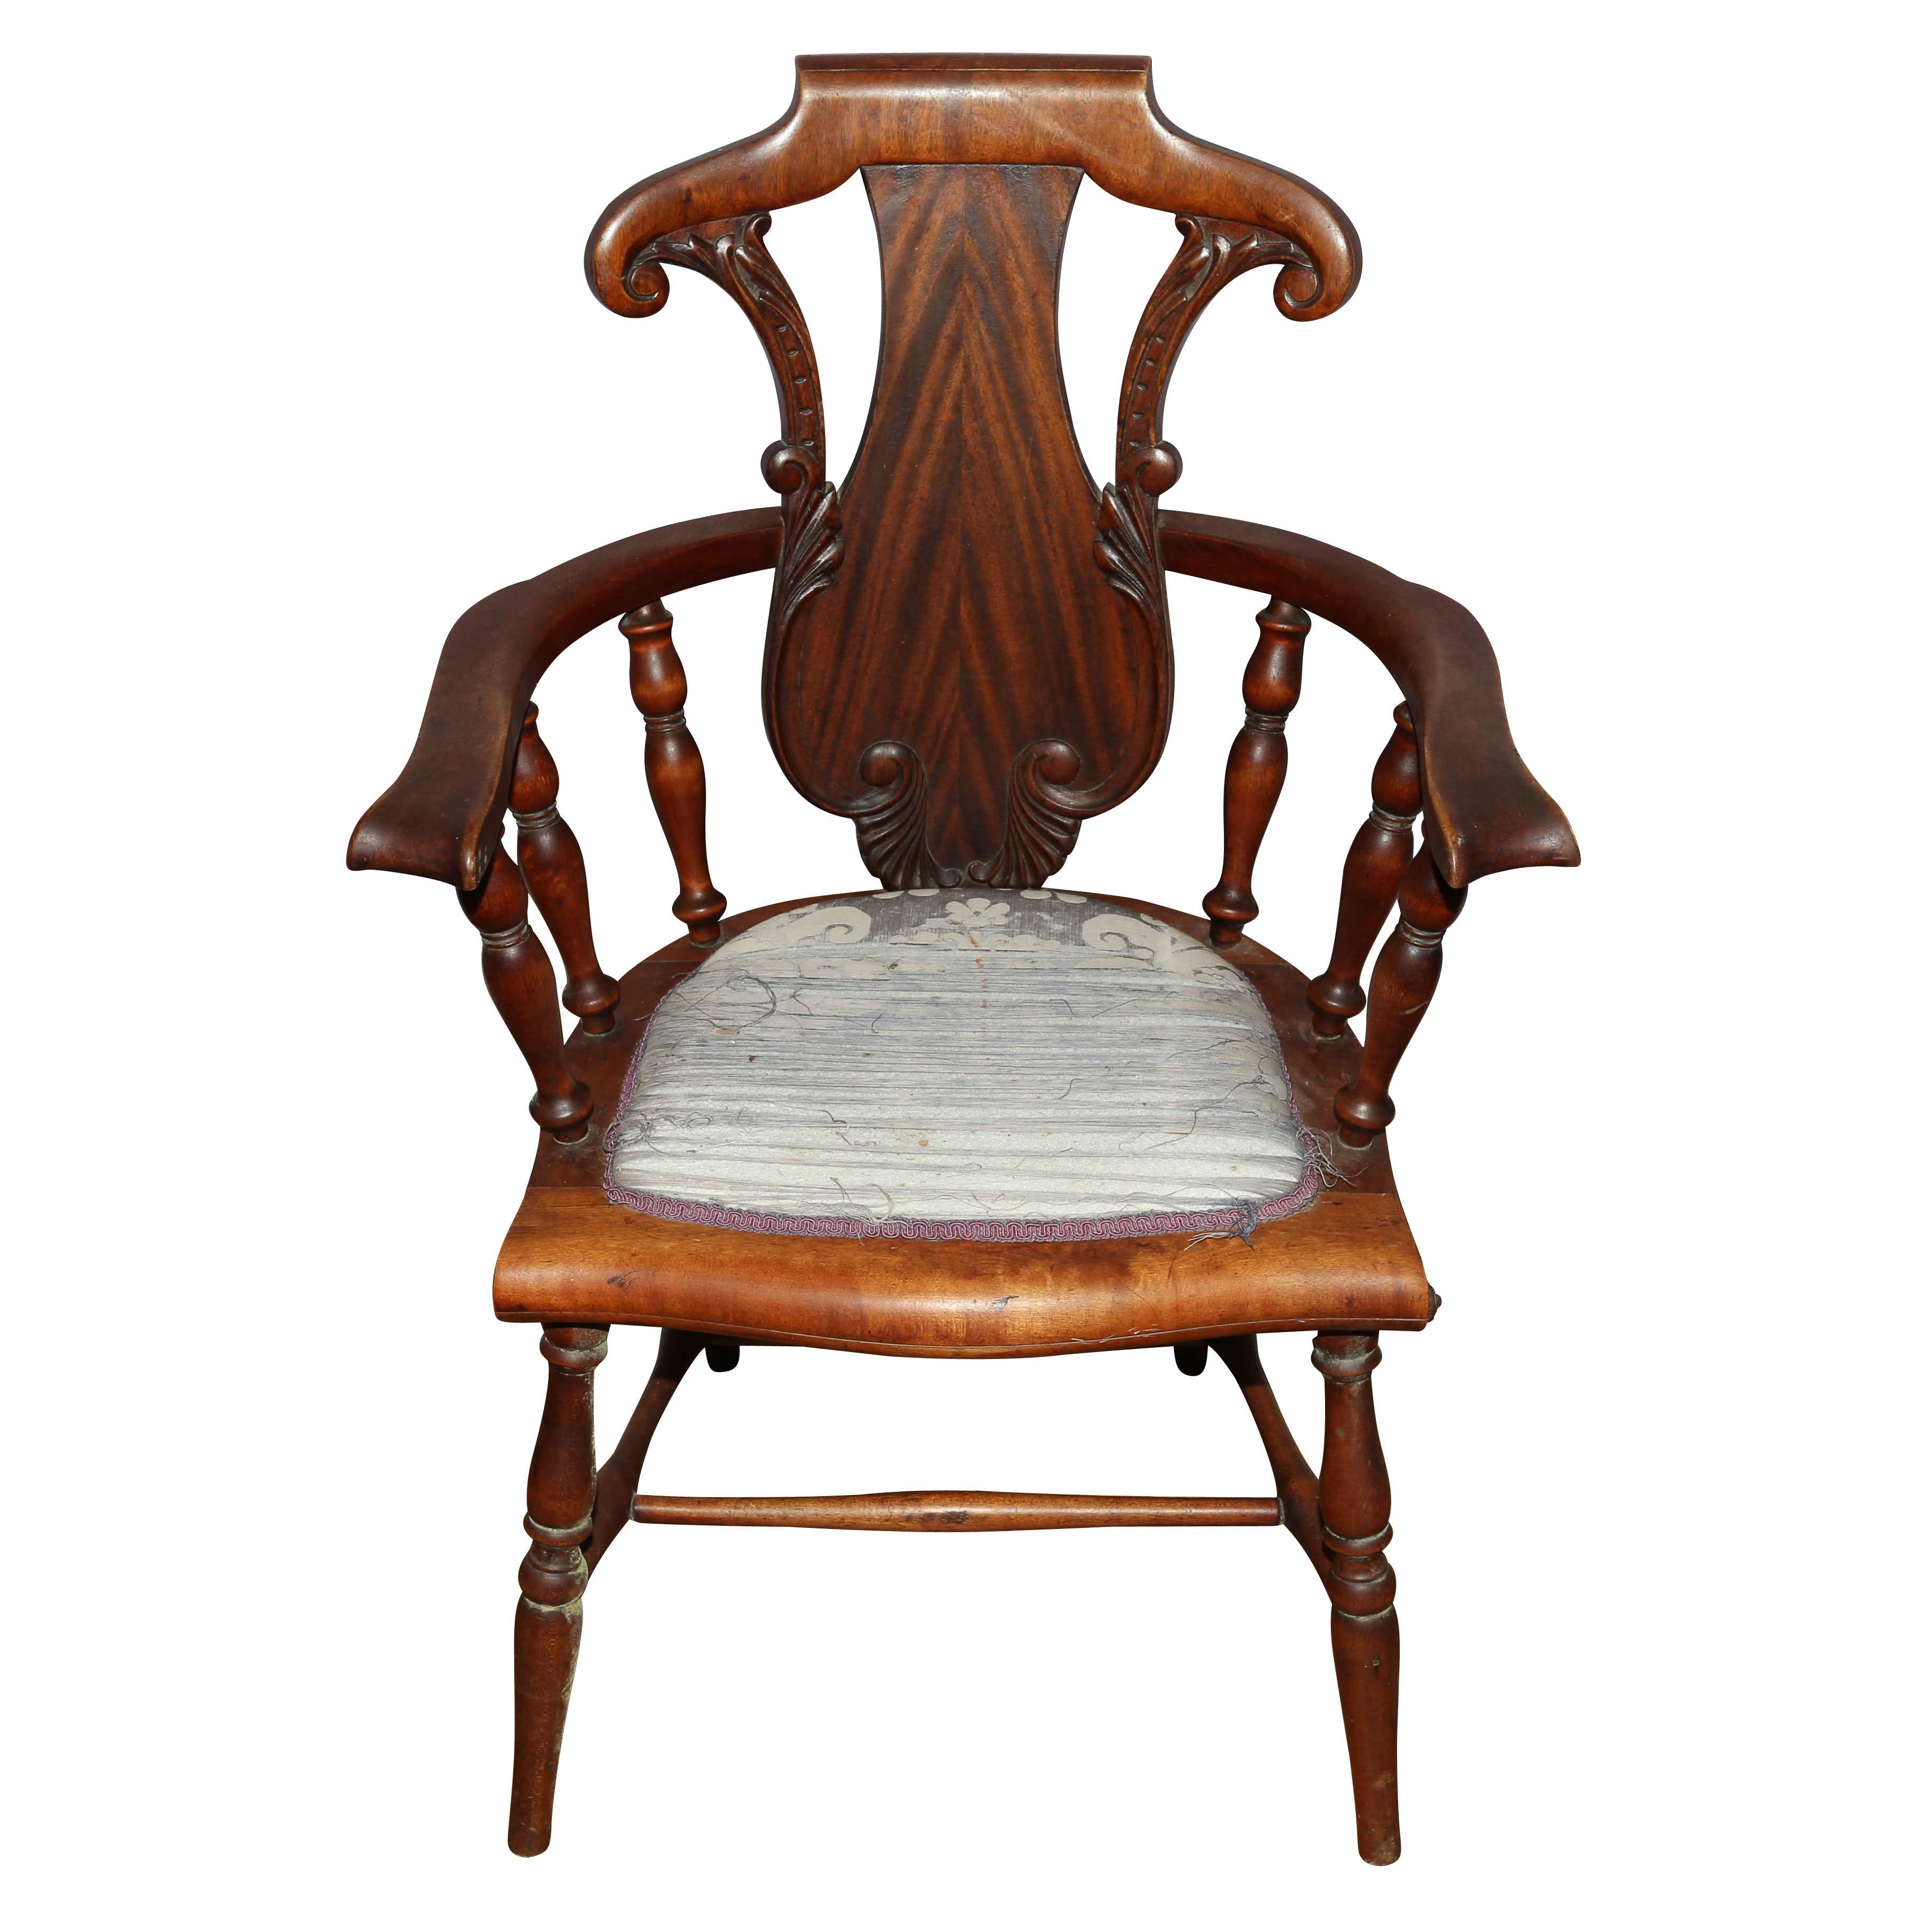 Matched Veneer Decorative Splat Windsor Style Captain's Chair